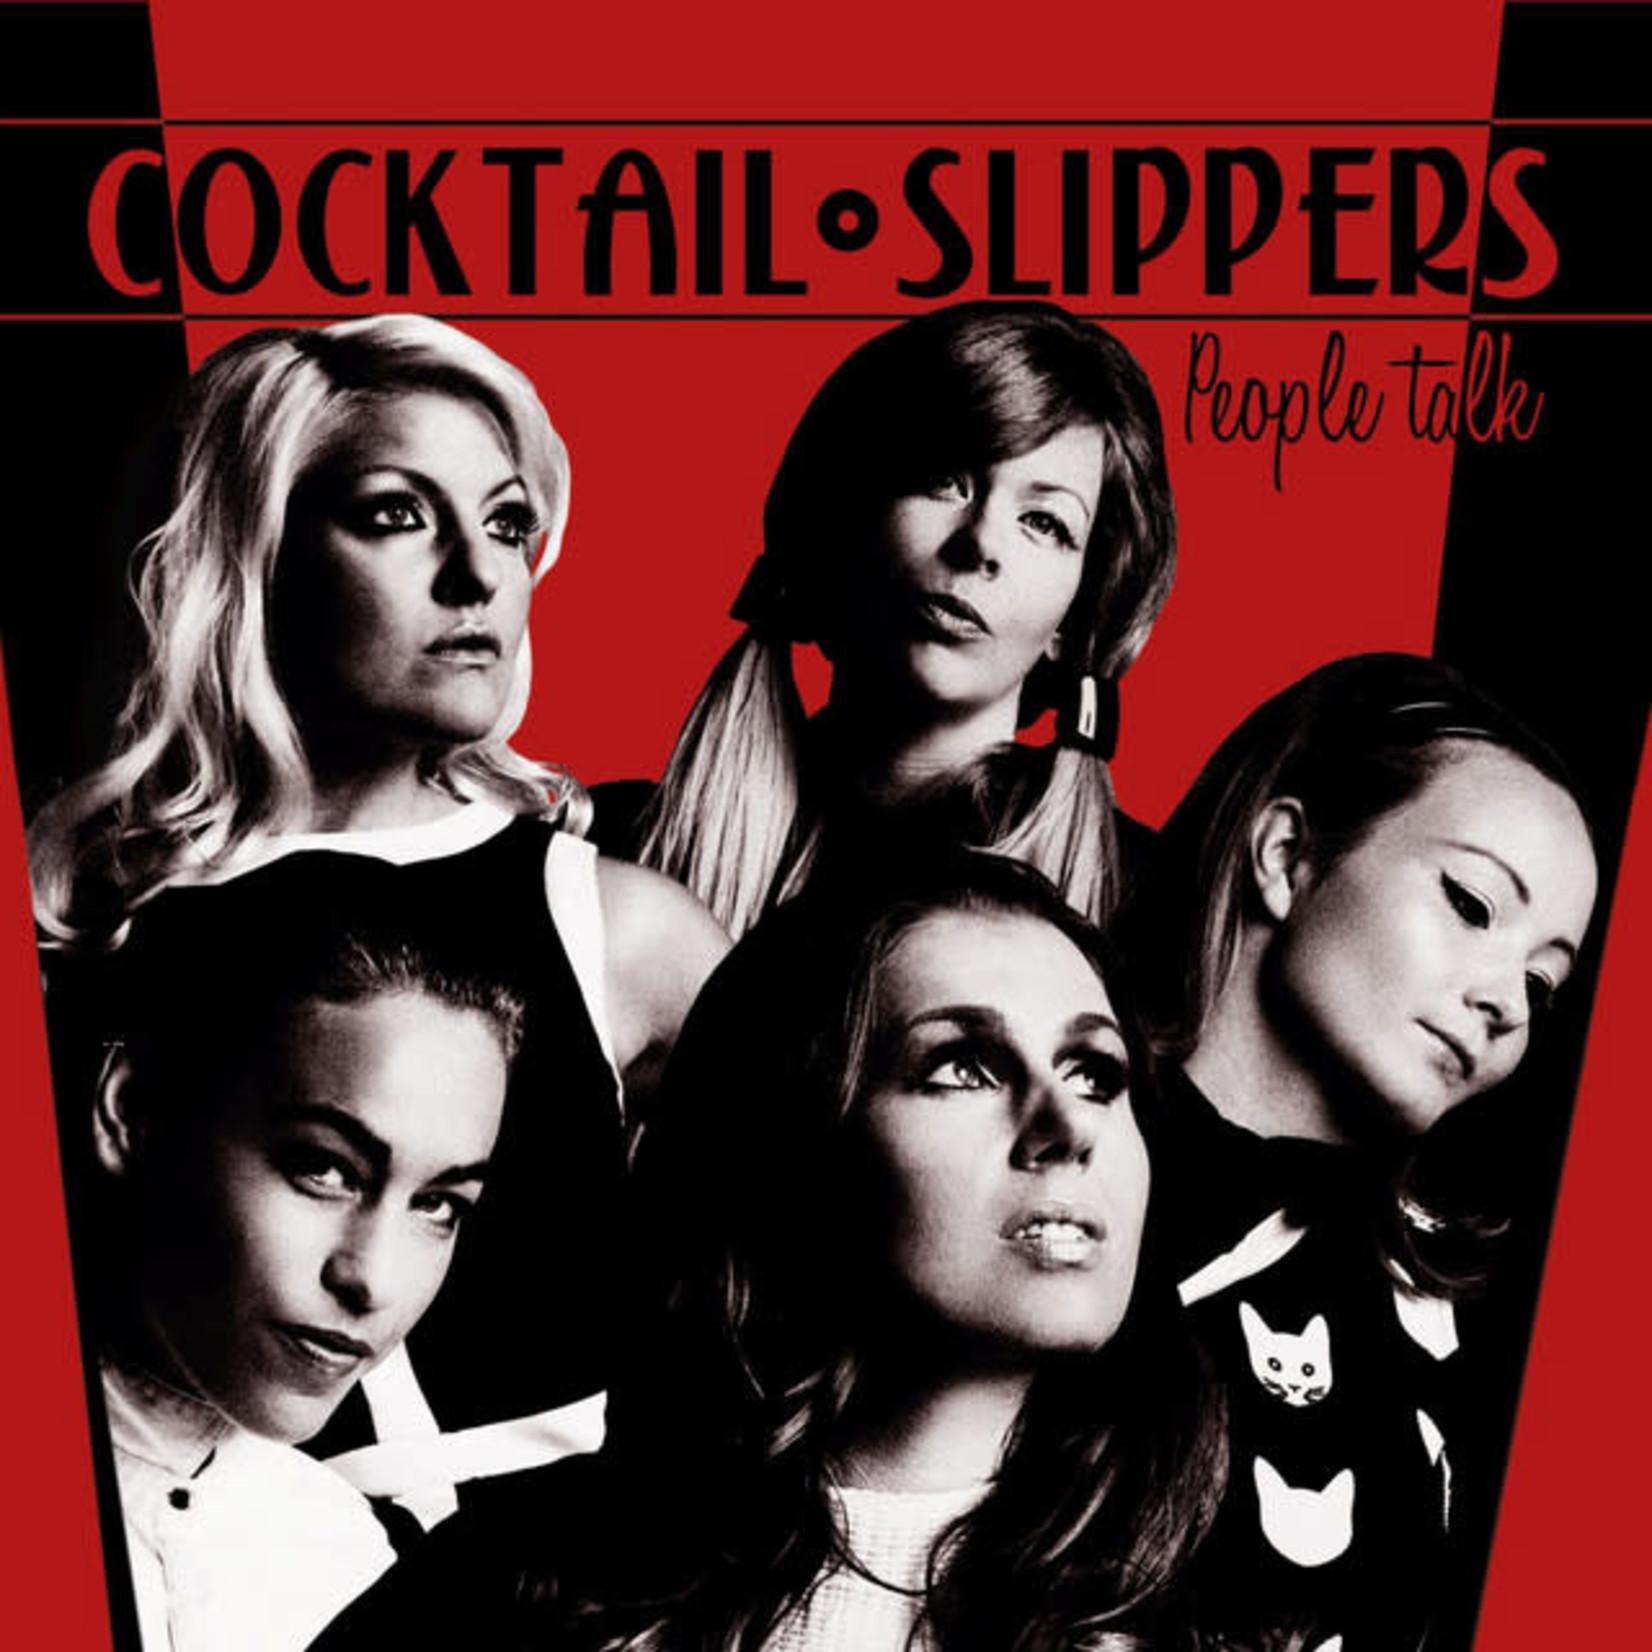 Vinyl Cocktail Slippers - People Talk